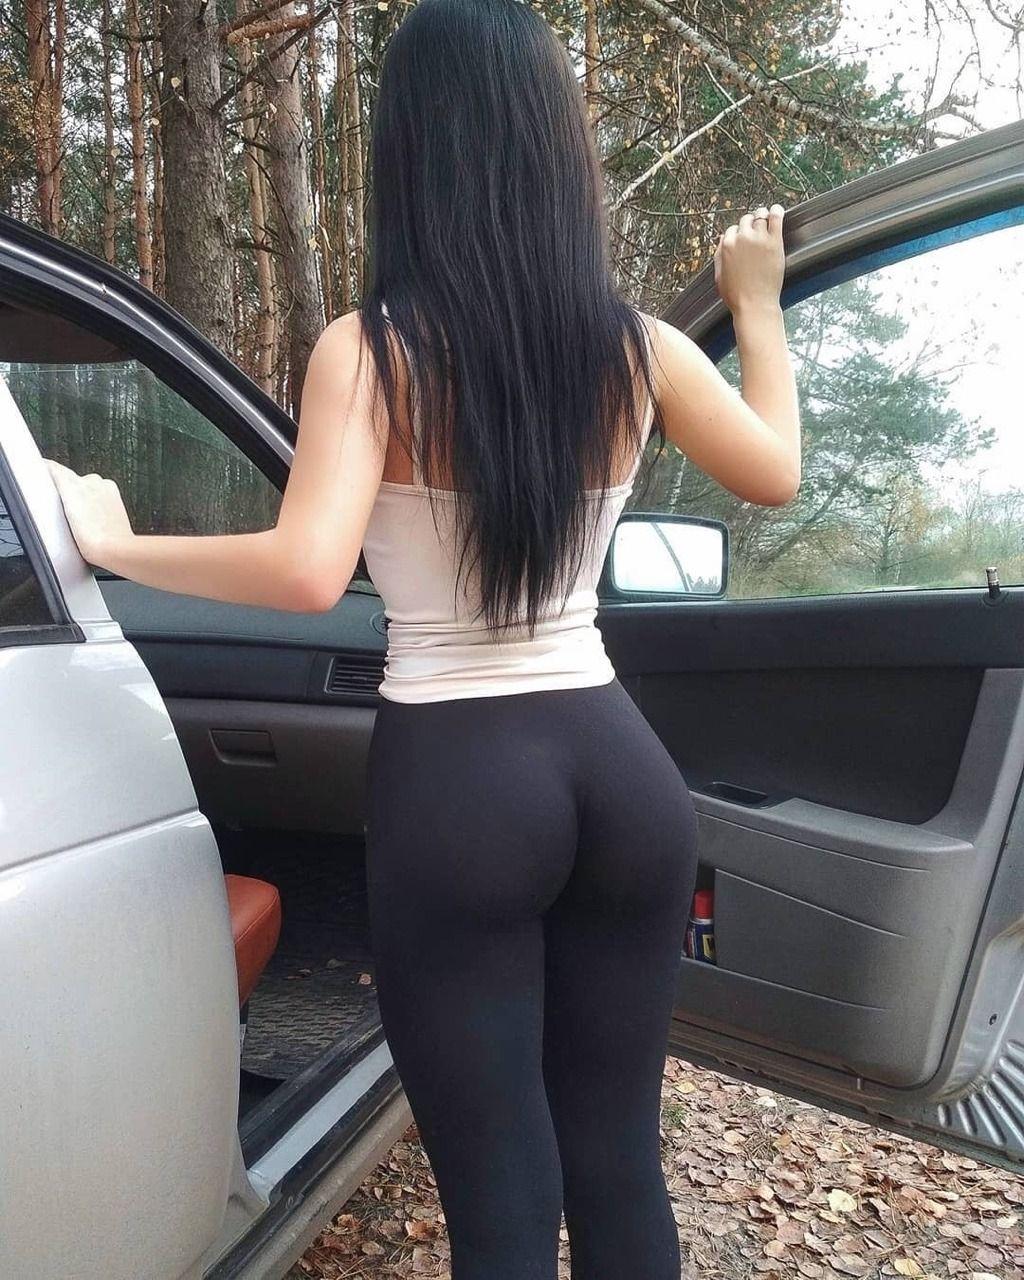 Fucked Ripped Yoga Pants